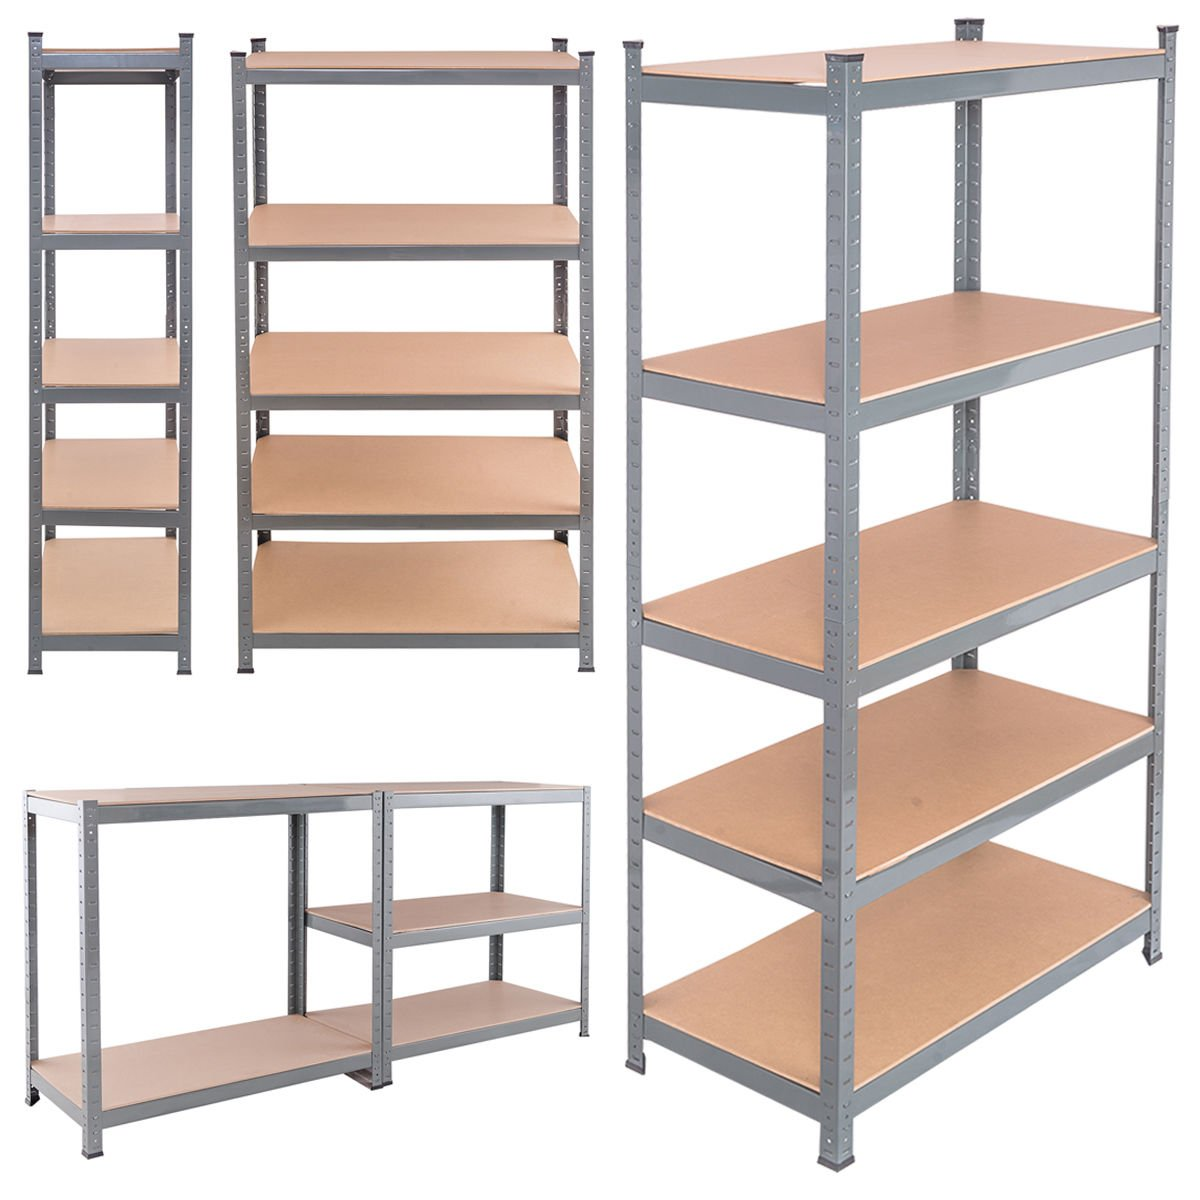 TANGKULA 72'' Heavy Duty Steel 5 Level Garage Shelf Metal Storage Adjustable Shelves Unit